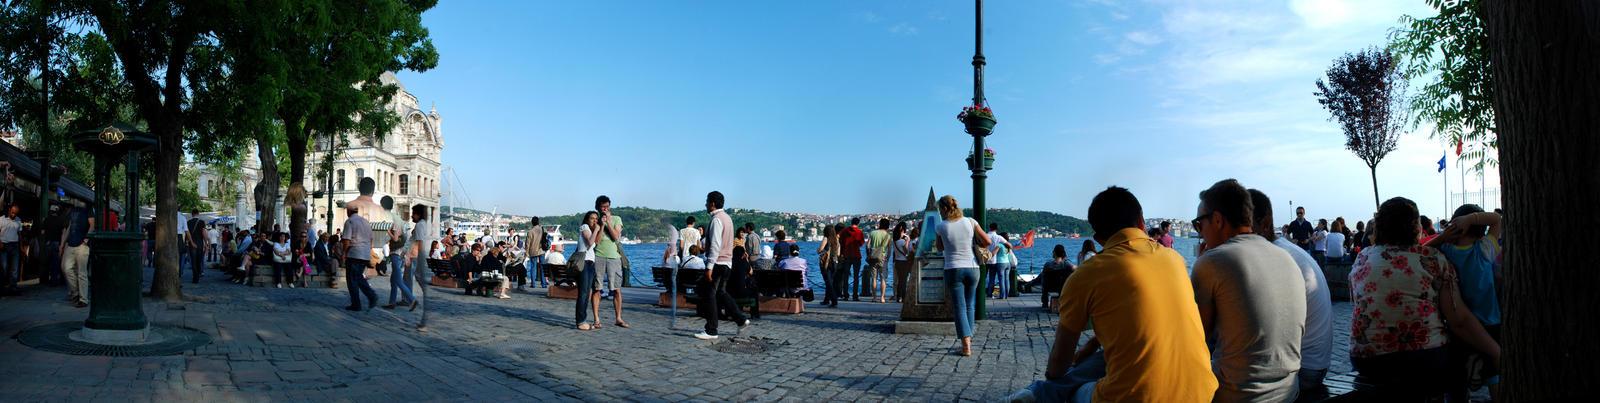 Ortakoy Square Panoramic 1